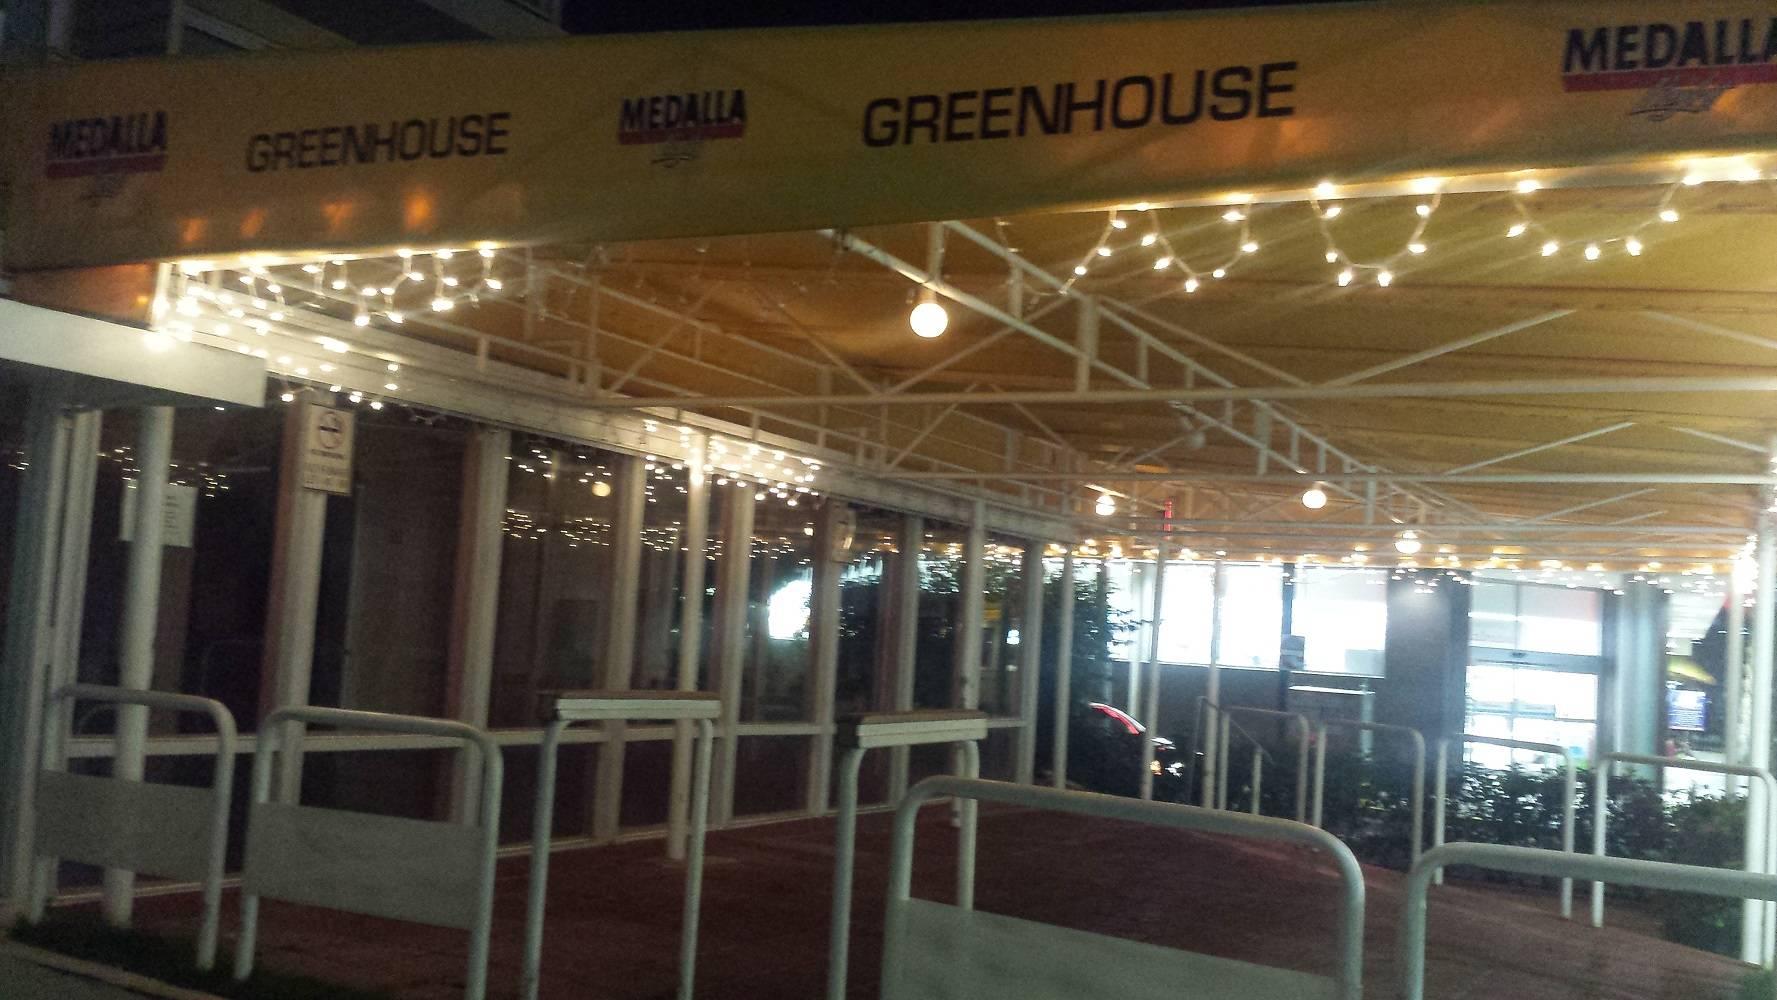 greenhouse01zulmanriverains400424261-921f69e9ddcceb99fd5f9491e5cff1be.jpg